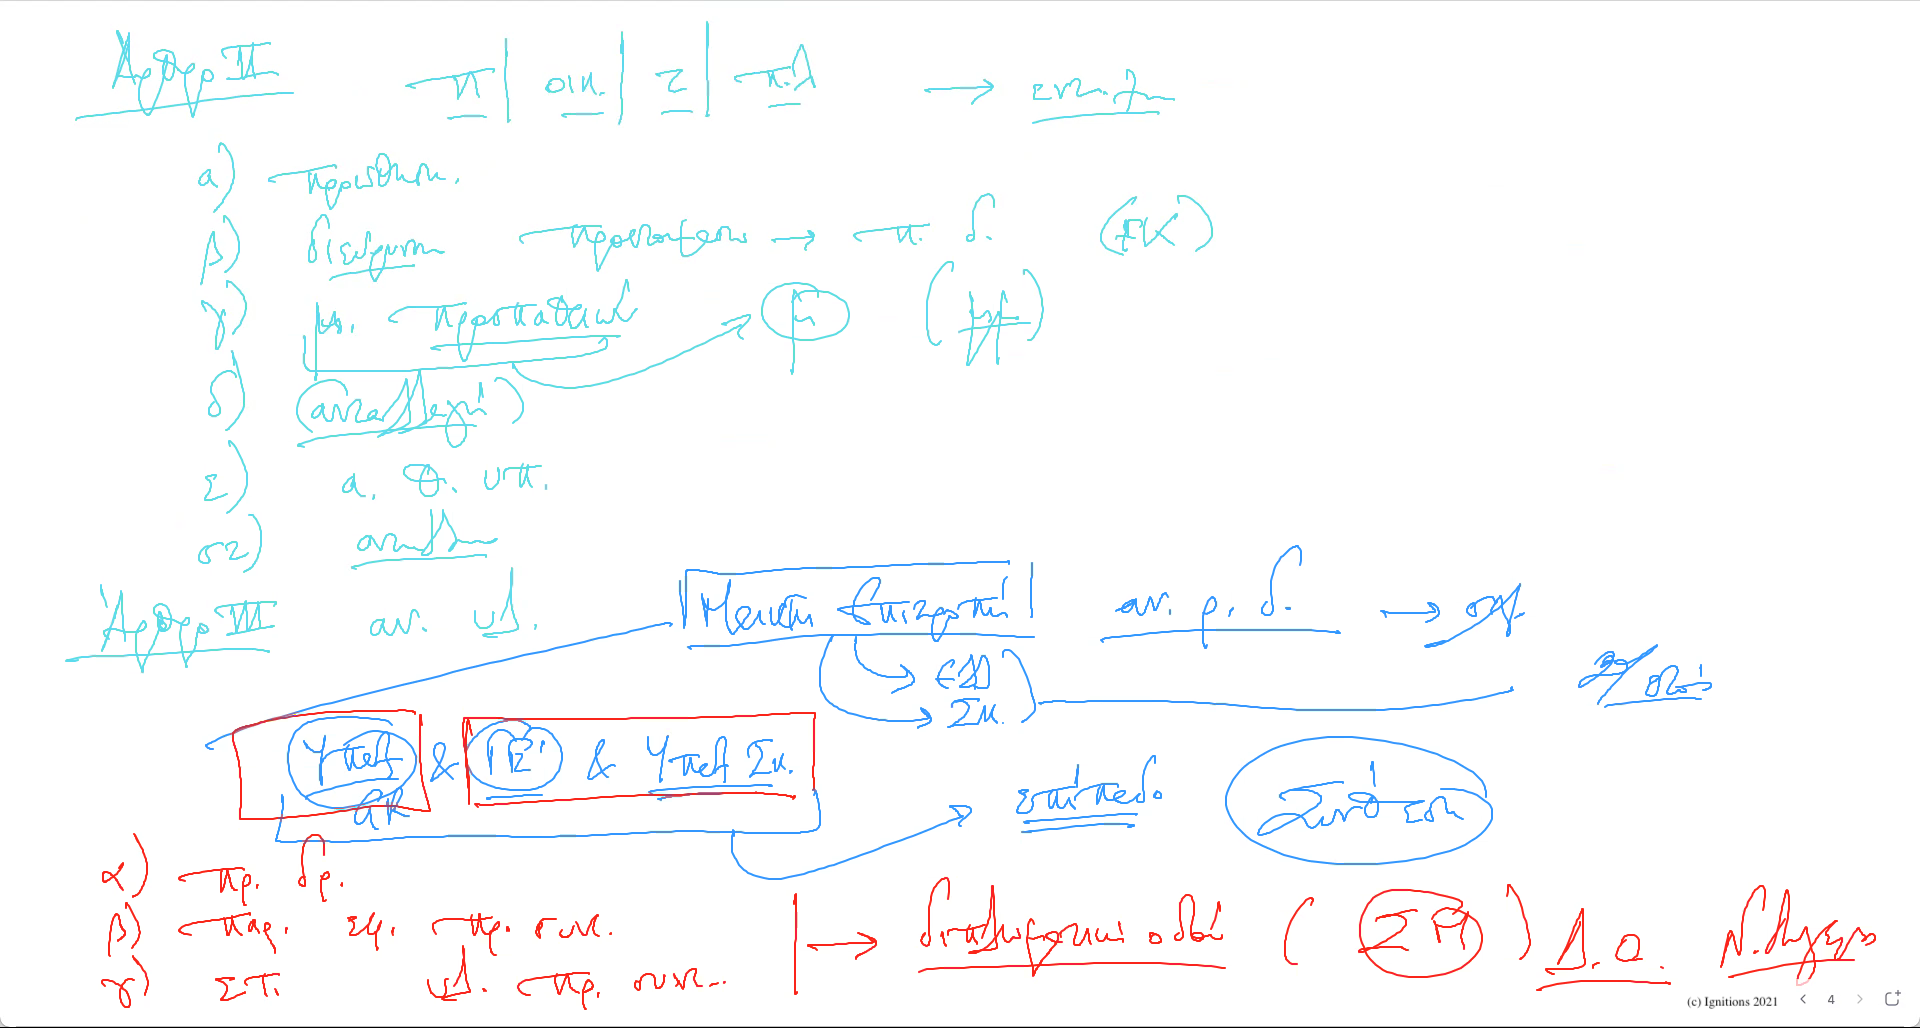 60800 - III - Στρατηγική ανάλυση Μνημονίου Συνεργασίας. ΔΙΑΡΚΕΙΑ VΙΙ. (Dessin)